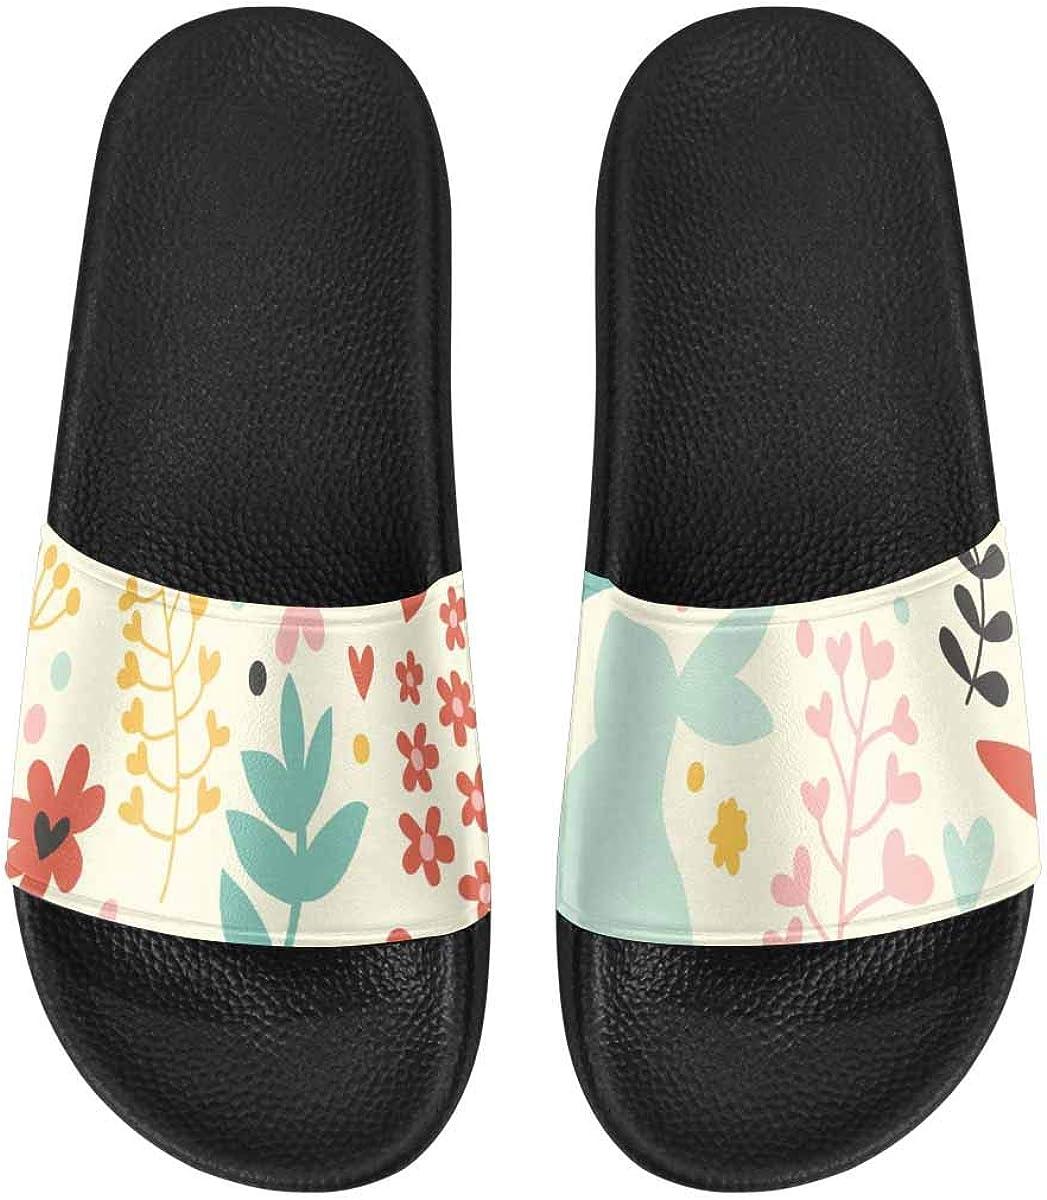 InterestPrint Slide Sandals for Women to Beach or Poor City Landscape Road